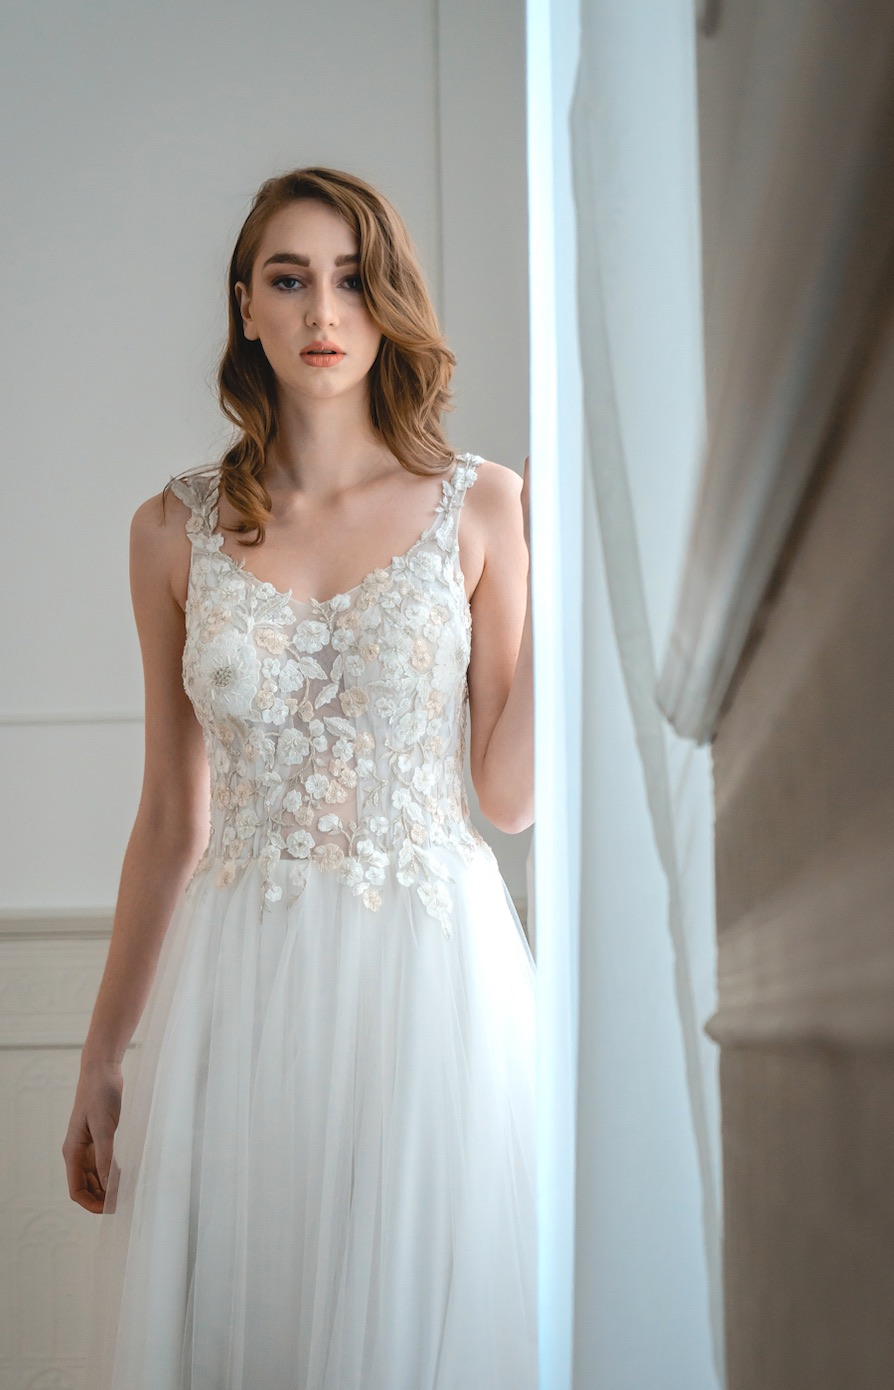 Bridal-Alkmini-08594.jpg